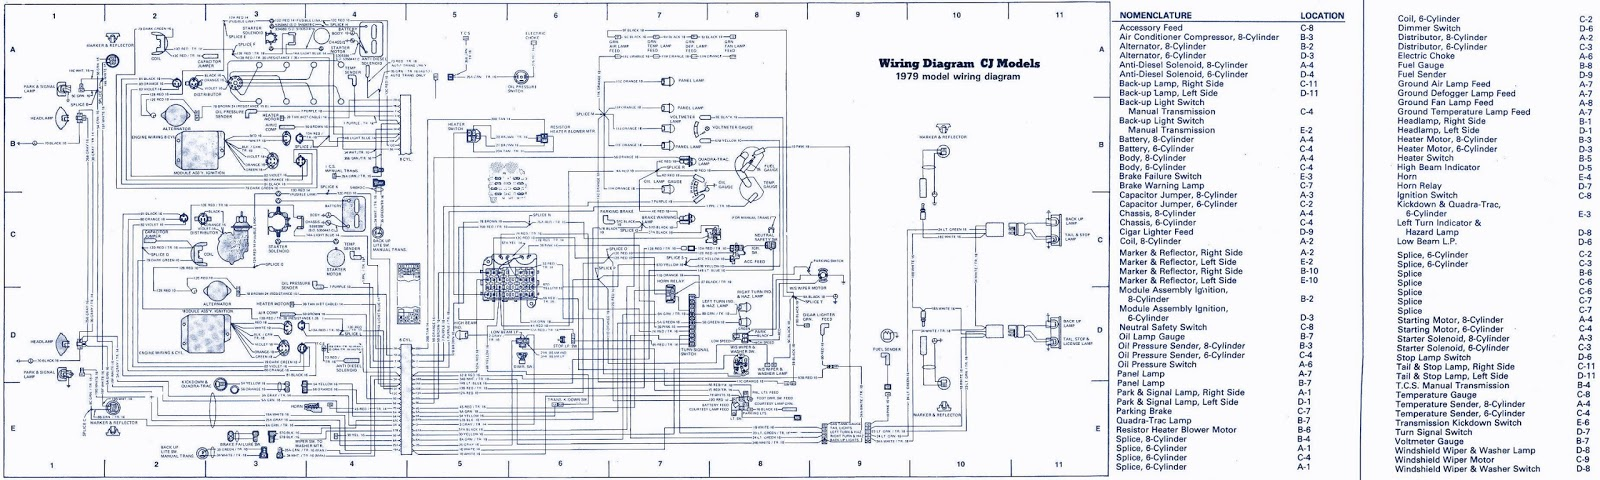 Cj7 350 Conversion Wiring Diagram - Wwwcaseistore \u2022